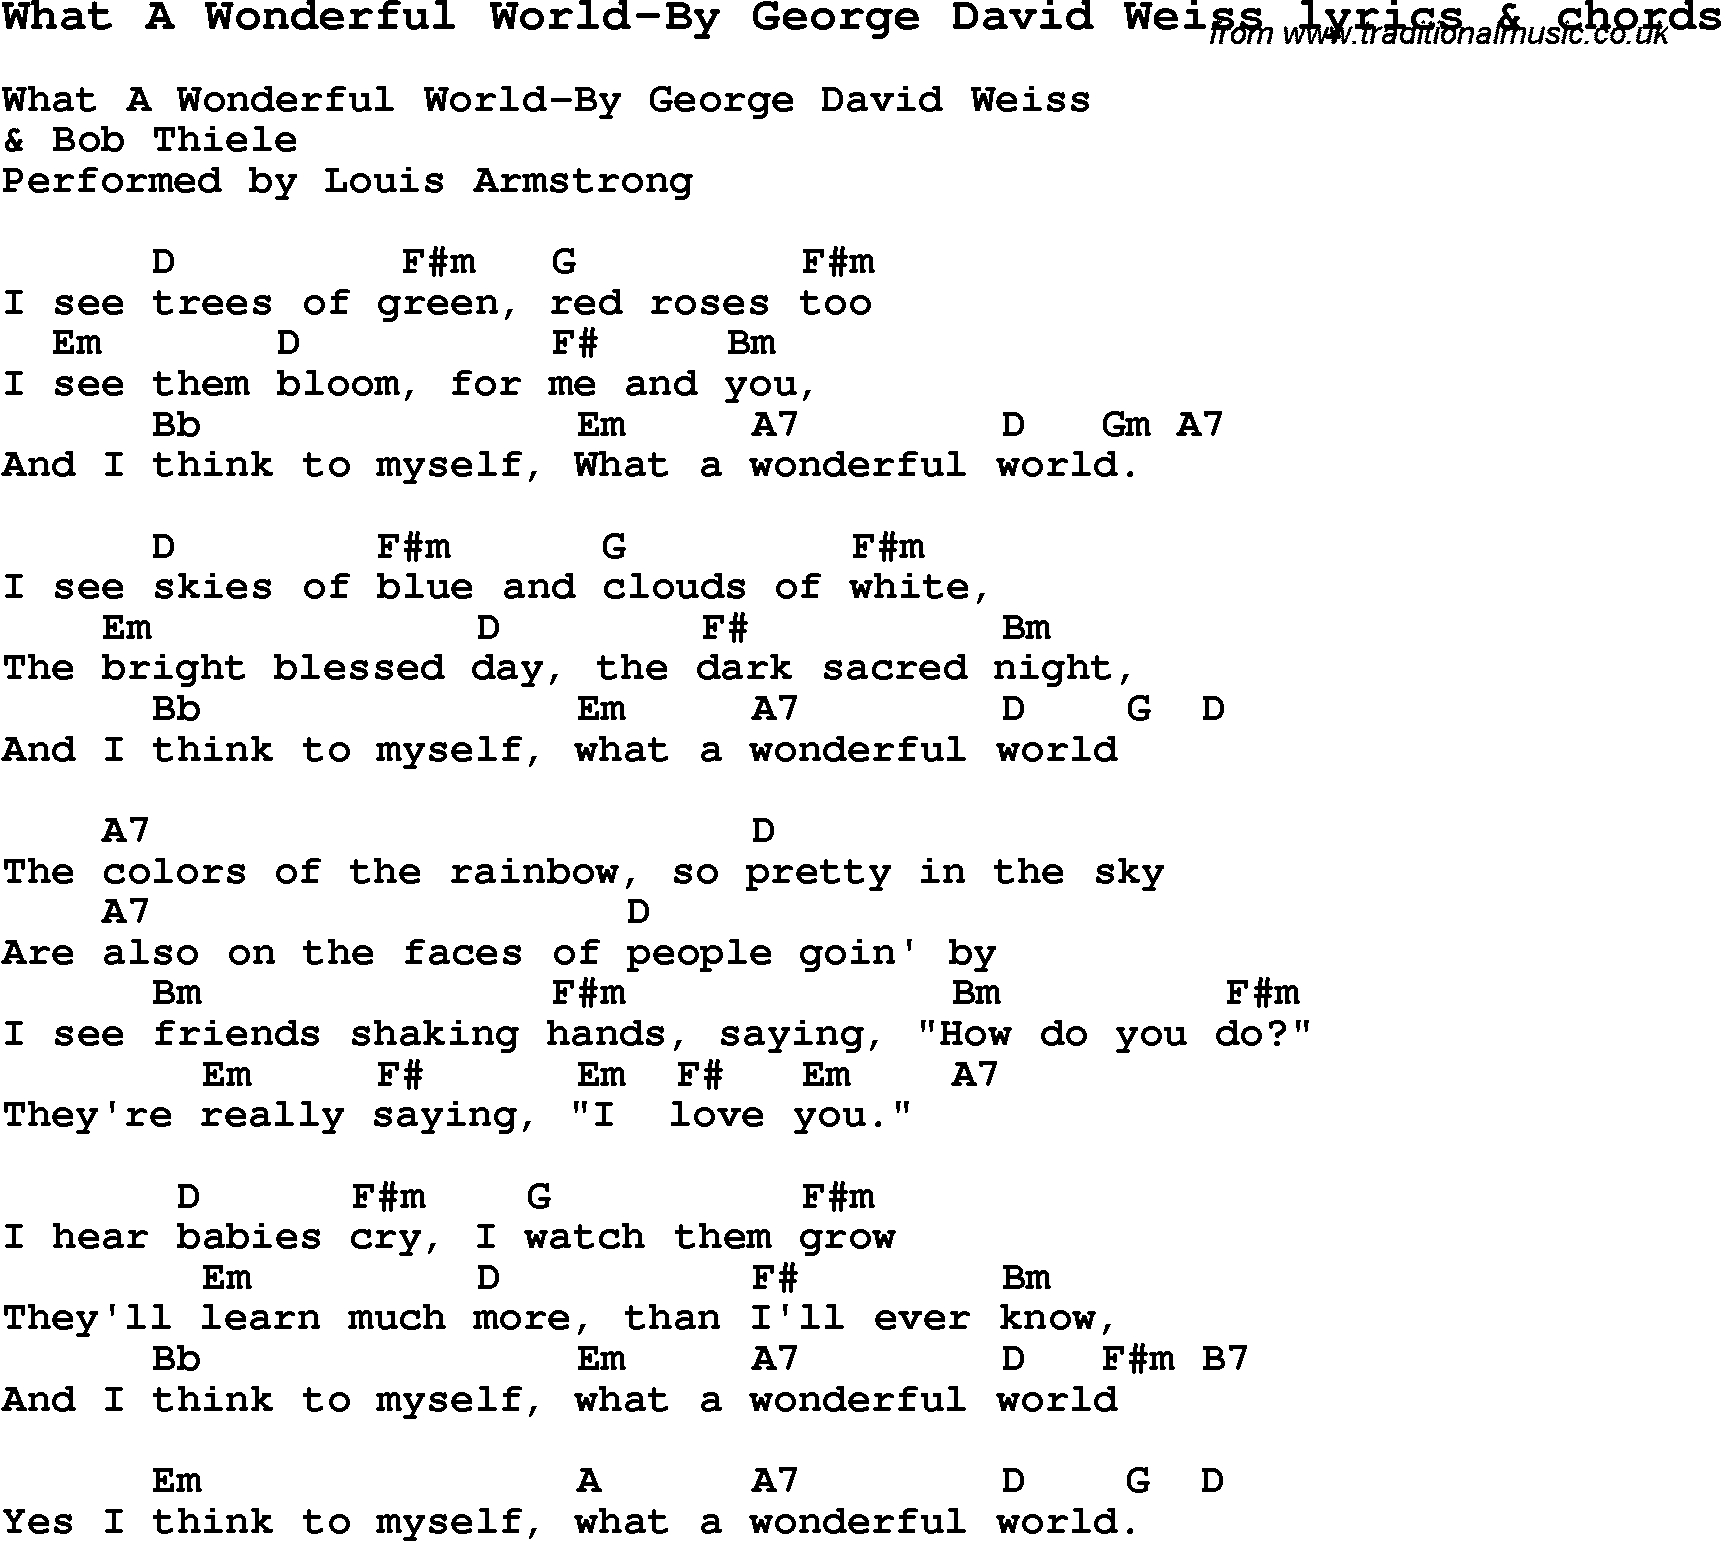 What A Wonderful World Chords Love Song Lyrics Forwhat A Wonderful World George David Weiss